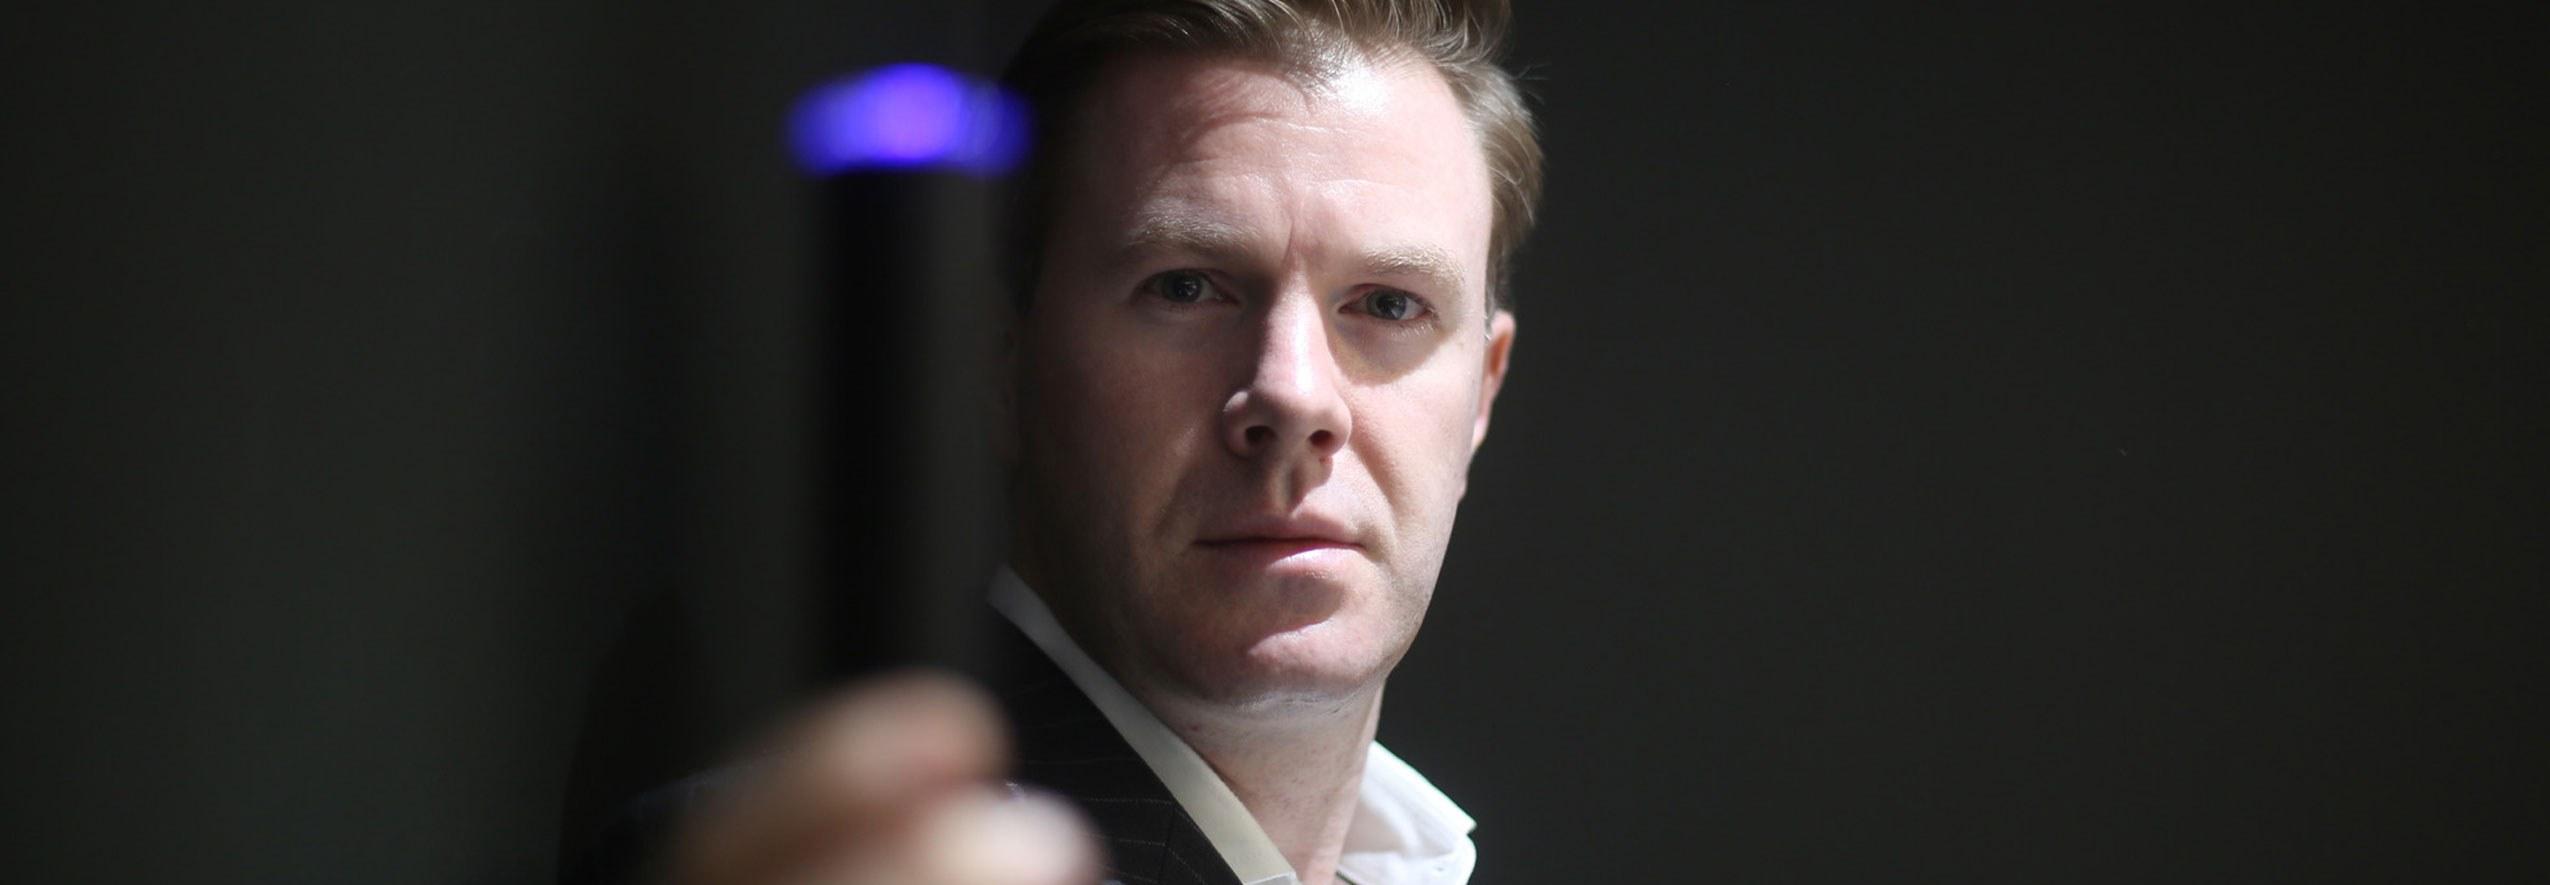 Man holds the LYMA laser